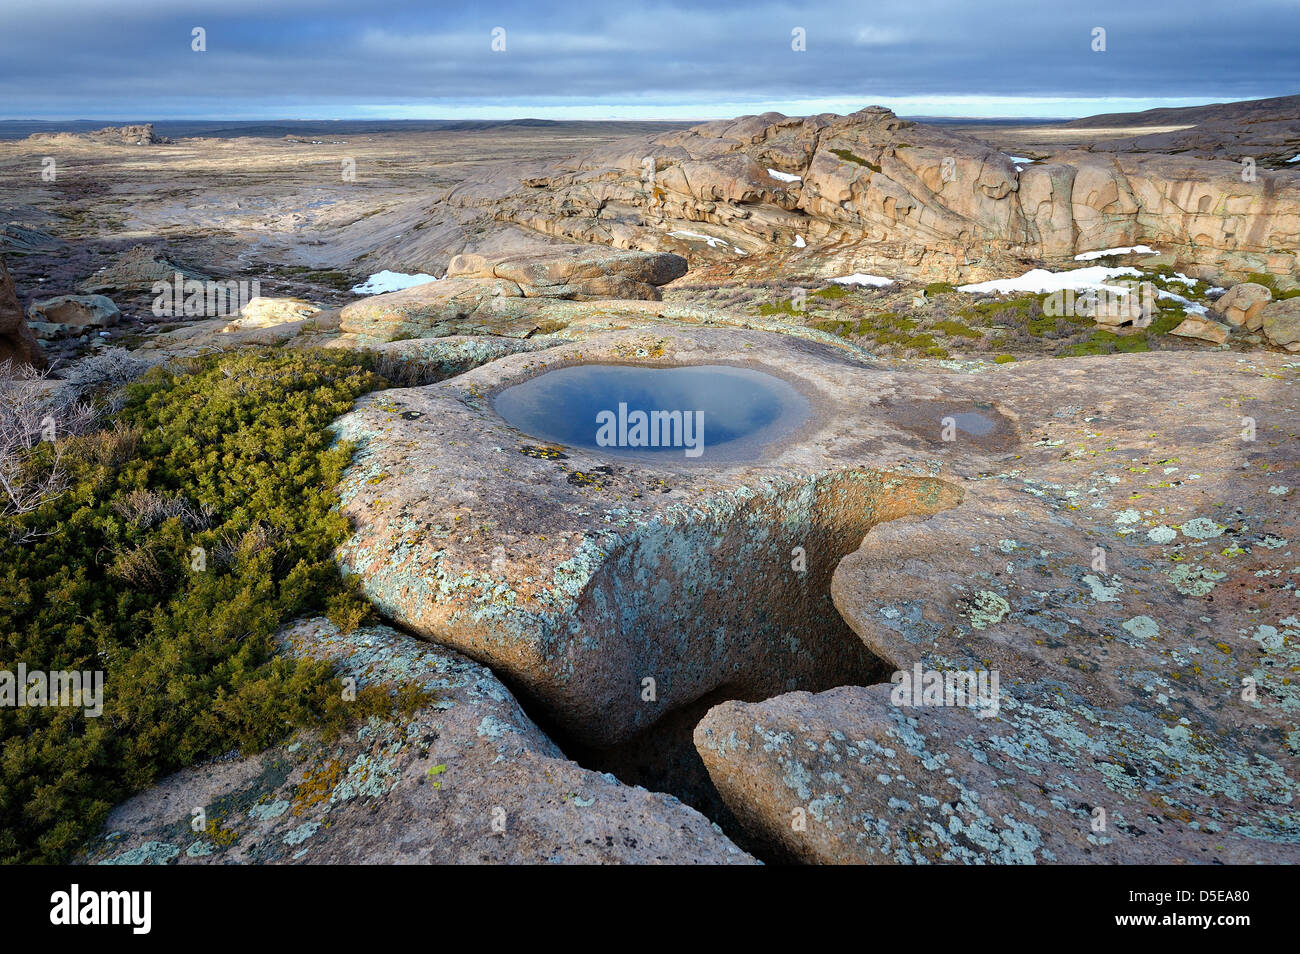 Stone basin in Bektau Ata, Kazakhstan. - Stock Image